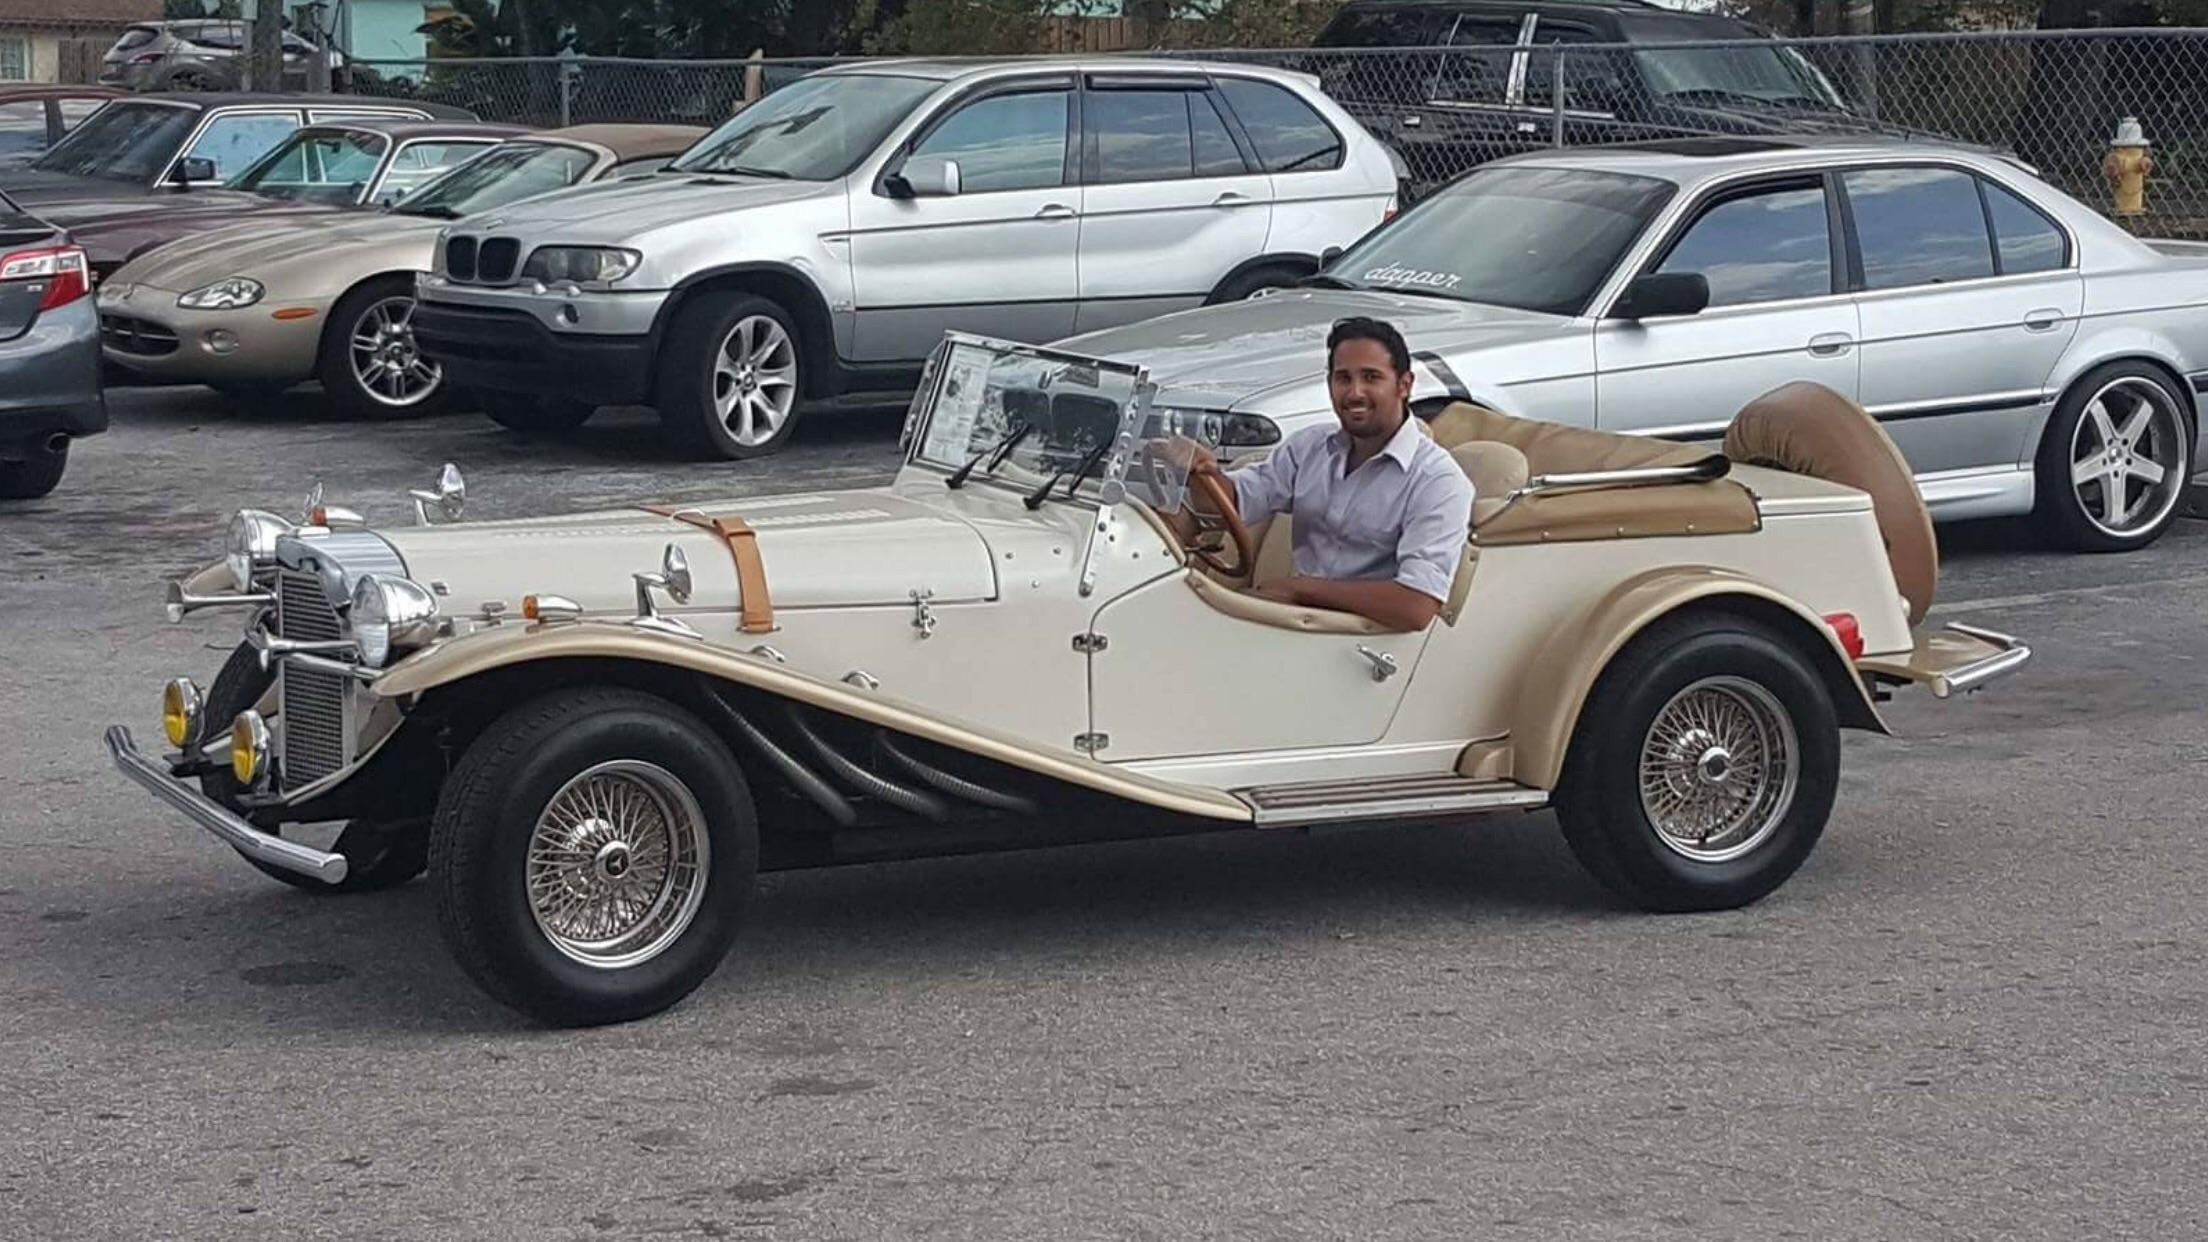 1929 Mercedes Benz Gazelle Replica Mercedes Benz Mercedes Benz